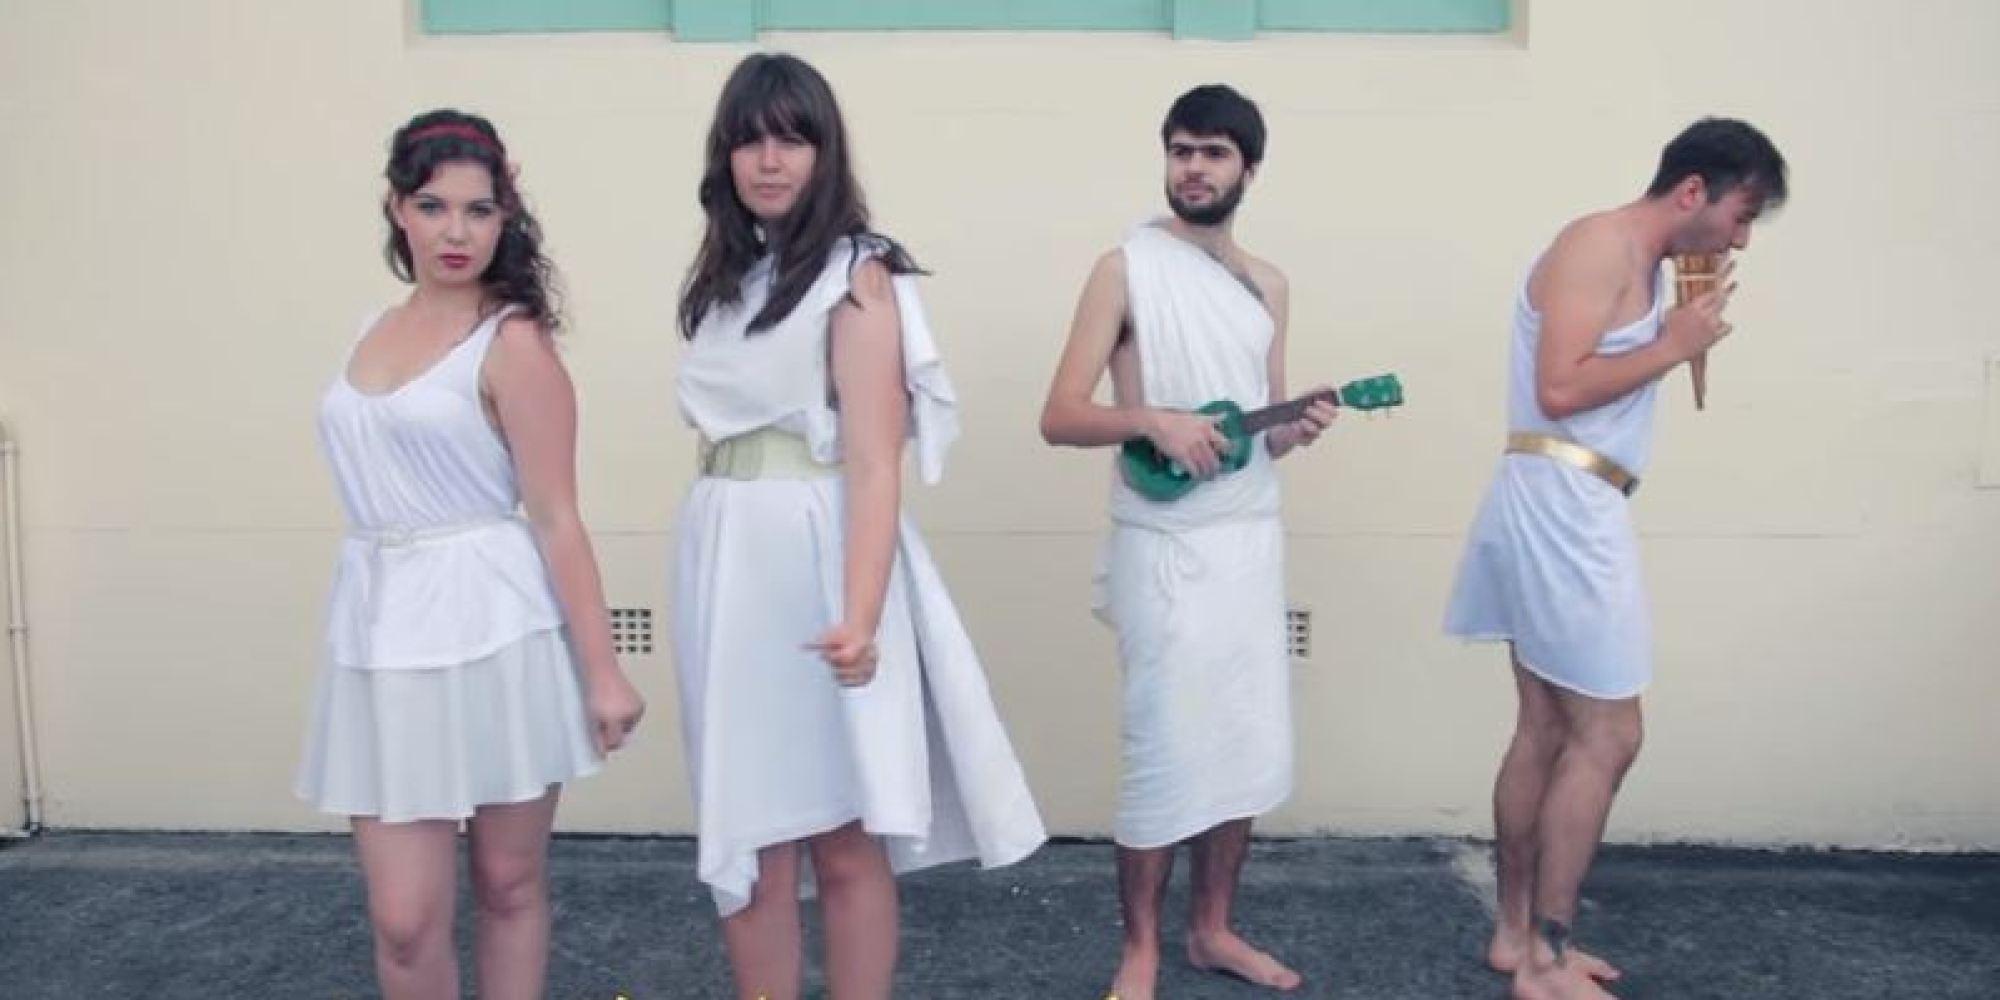 Nεοζηλανδοί φοιτητές έφτιαξαν την αρχαιοελληνική διασκευή του Mamma Mia